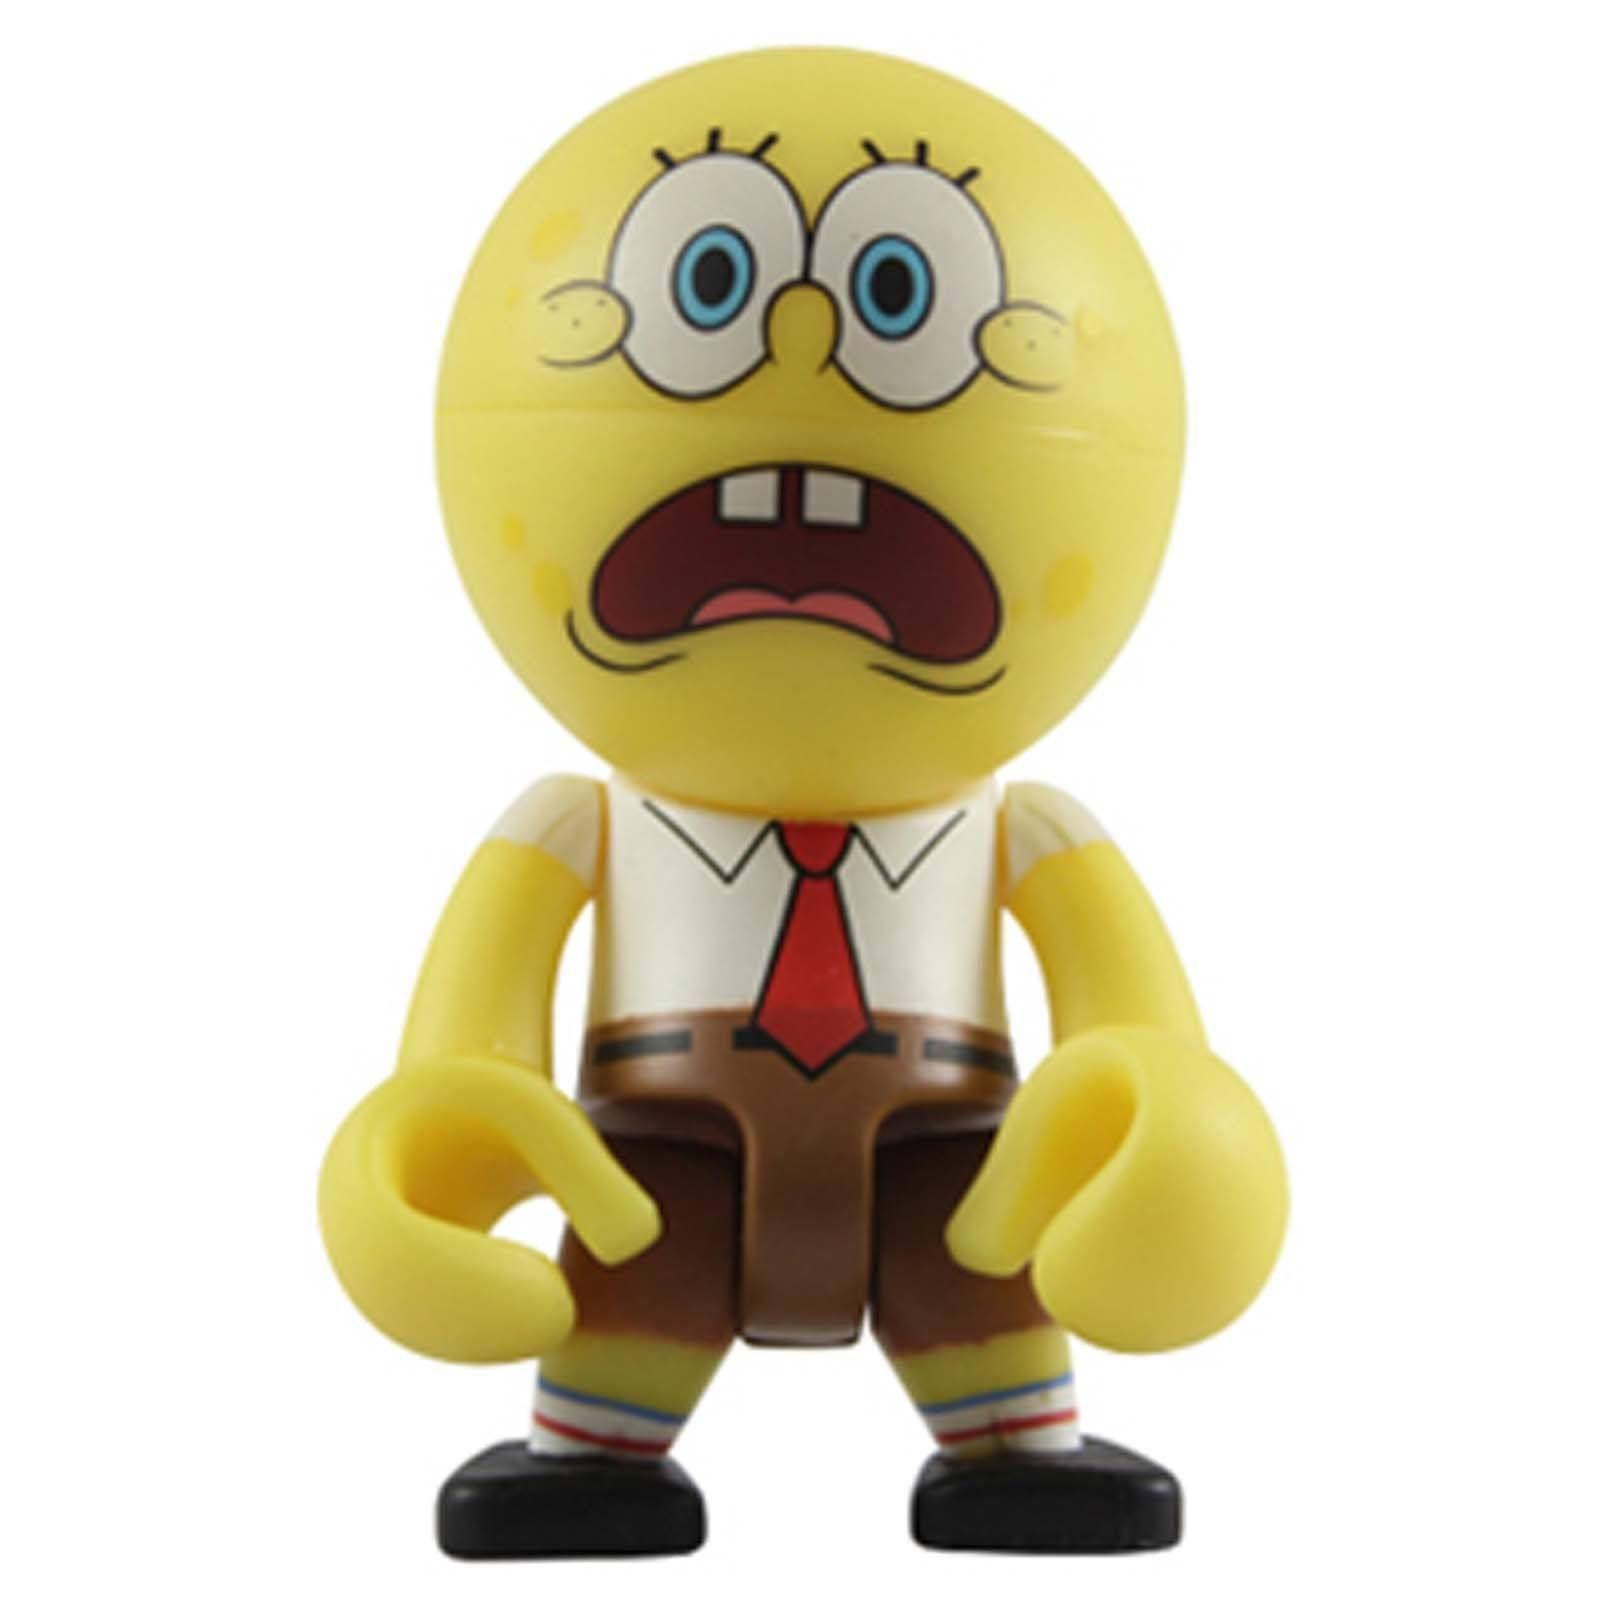 Spongebob Squarepants /& Friends Trexi Mini Figures Squidward Tentacles